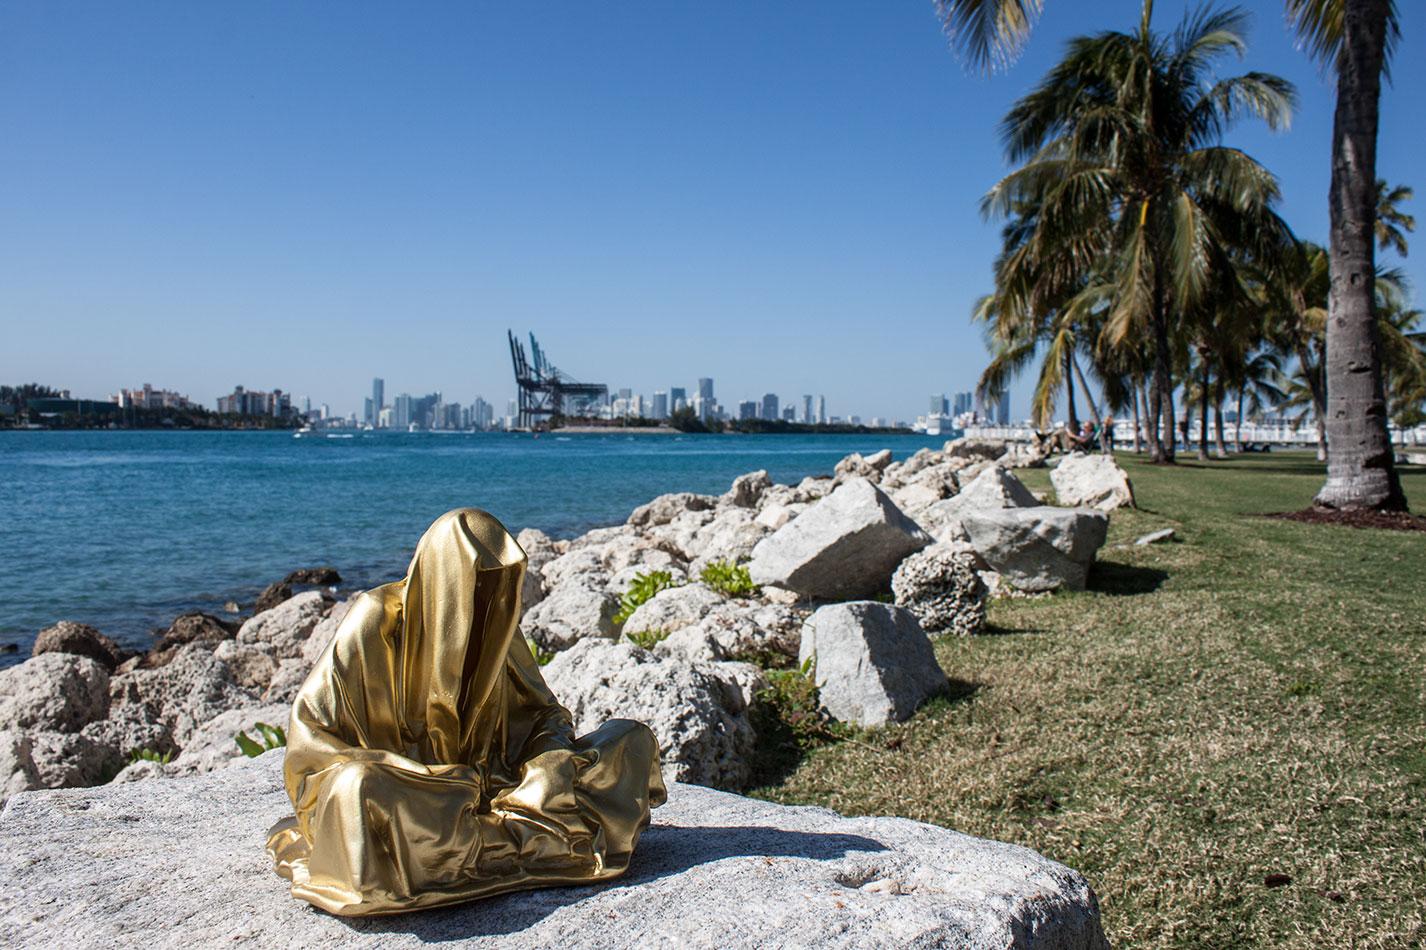 public-art-basel-miami-beach-fair-usa-florida-guardians-of-time-manfred-kili-kielnhofer-contemporary-fine-art-modern-arts-design-antiques-sculpture-6821